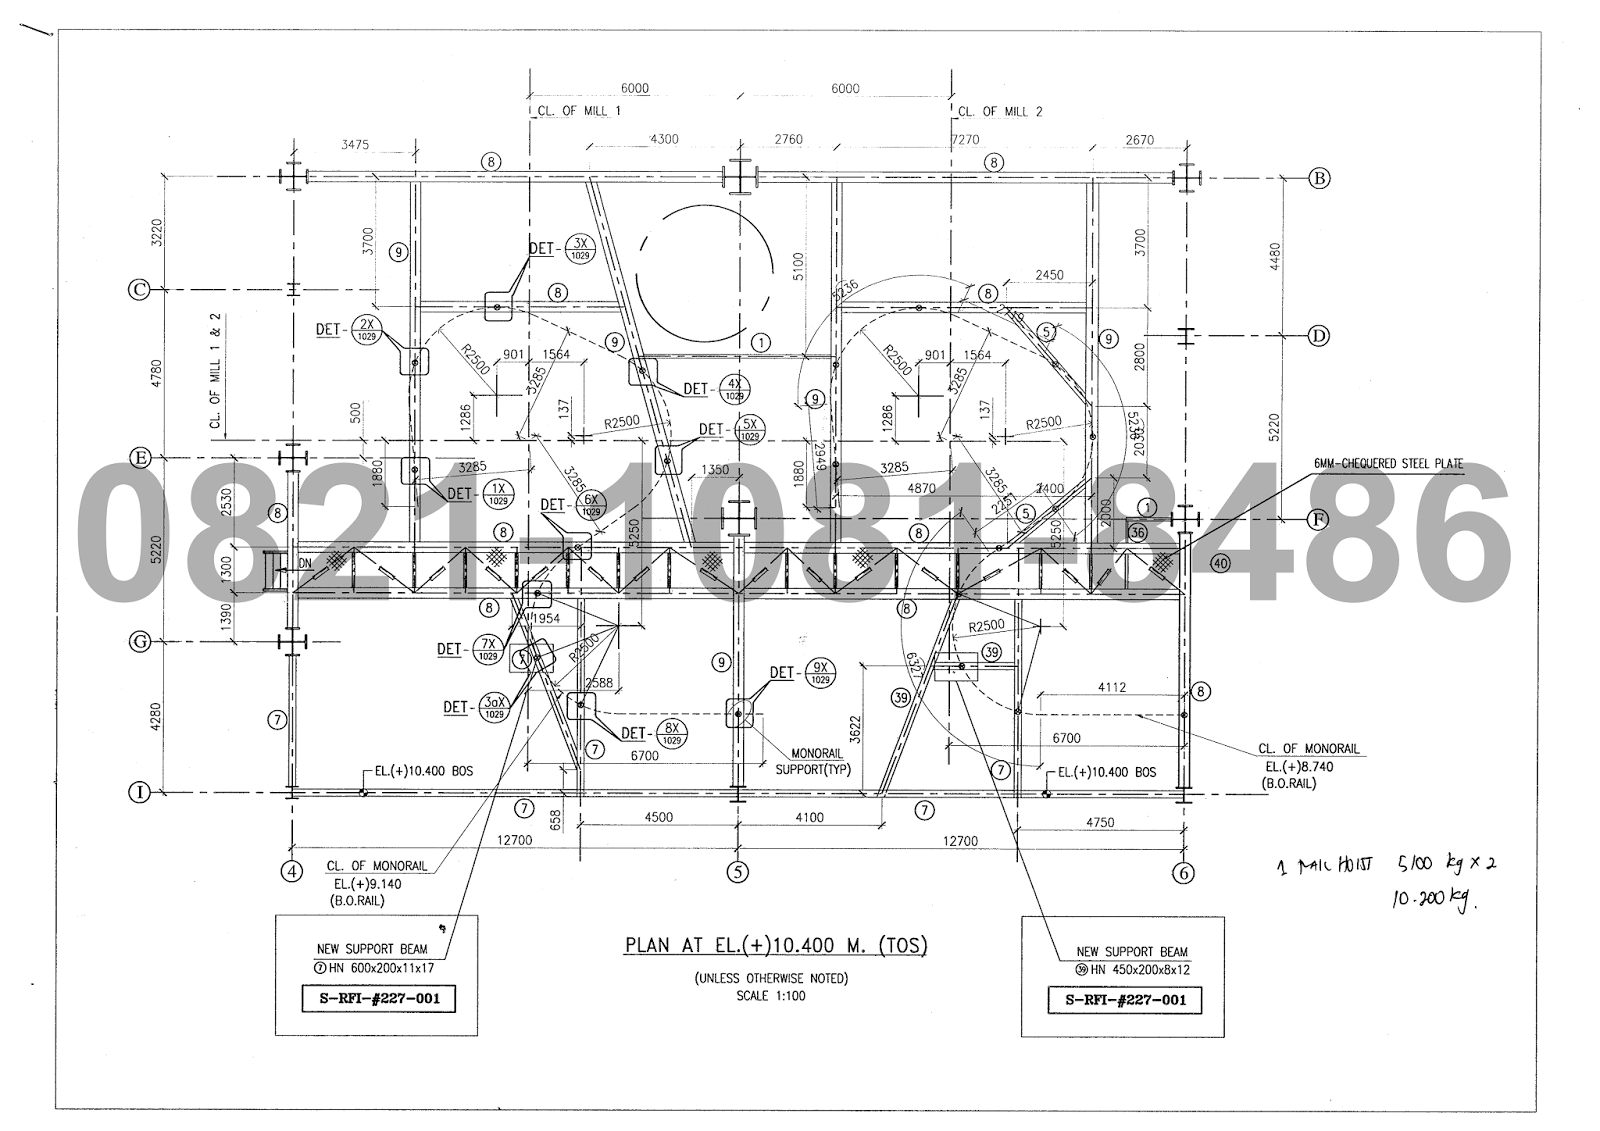 Jasa fabrikasi crane monorail wilayah jakarta dan sekitarnya jasa desain crane monorail fandeluxe Choice Image